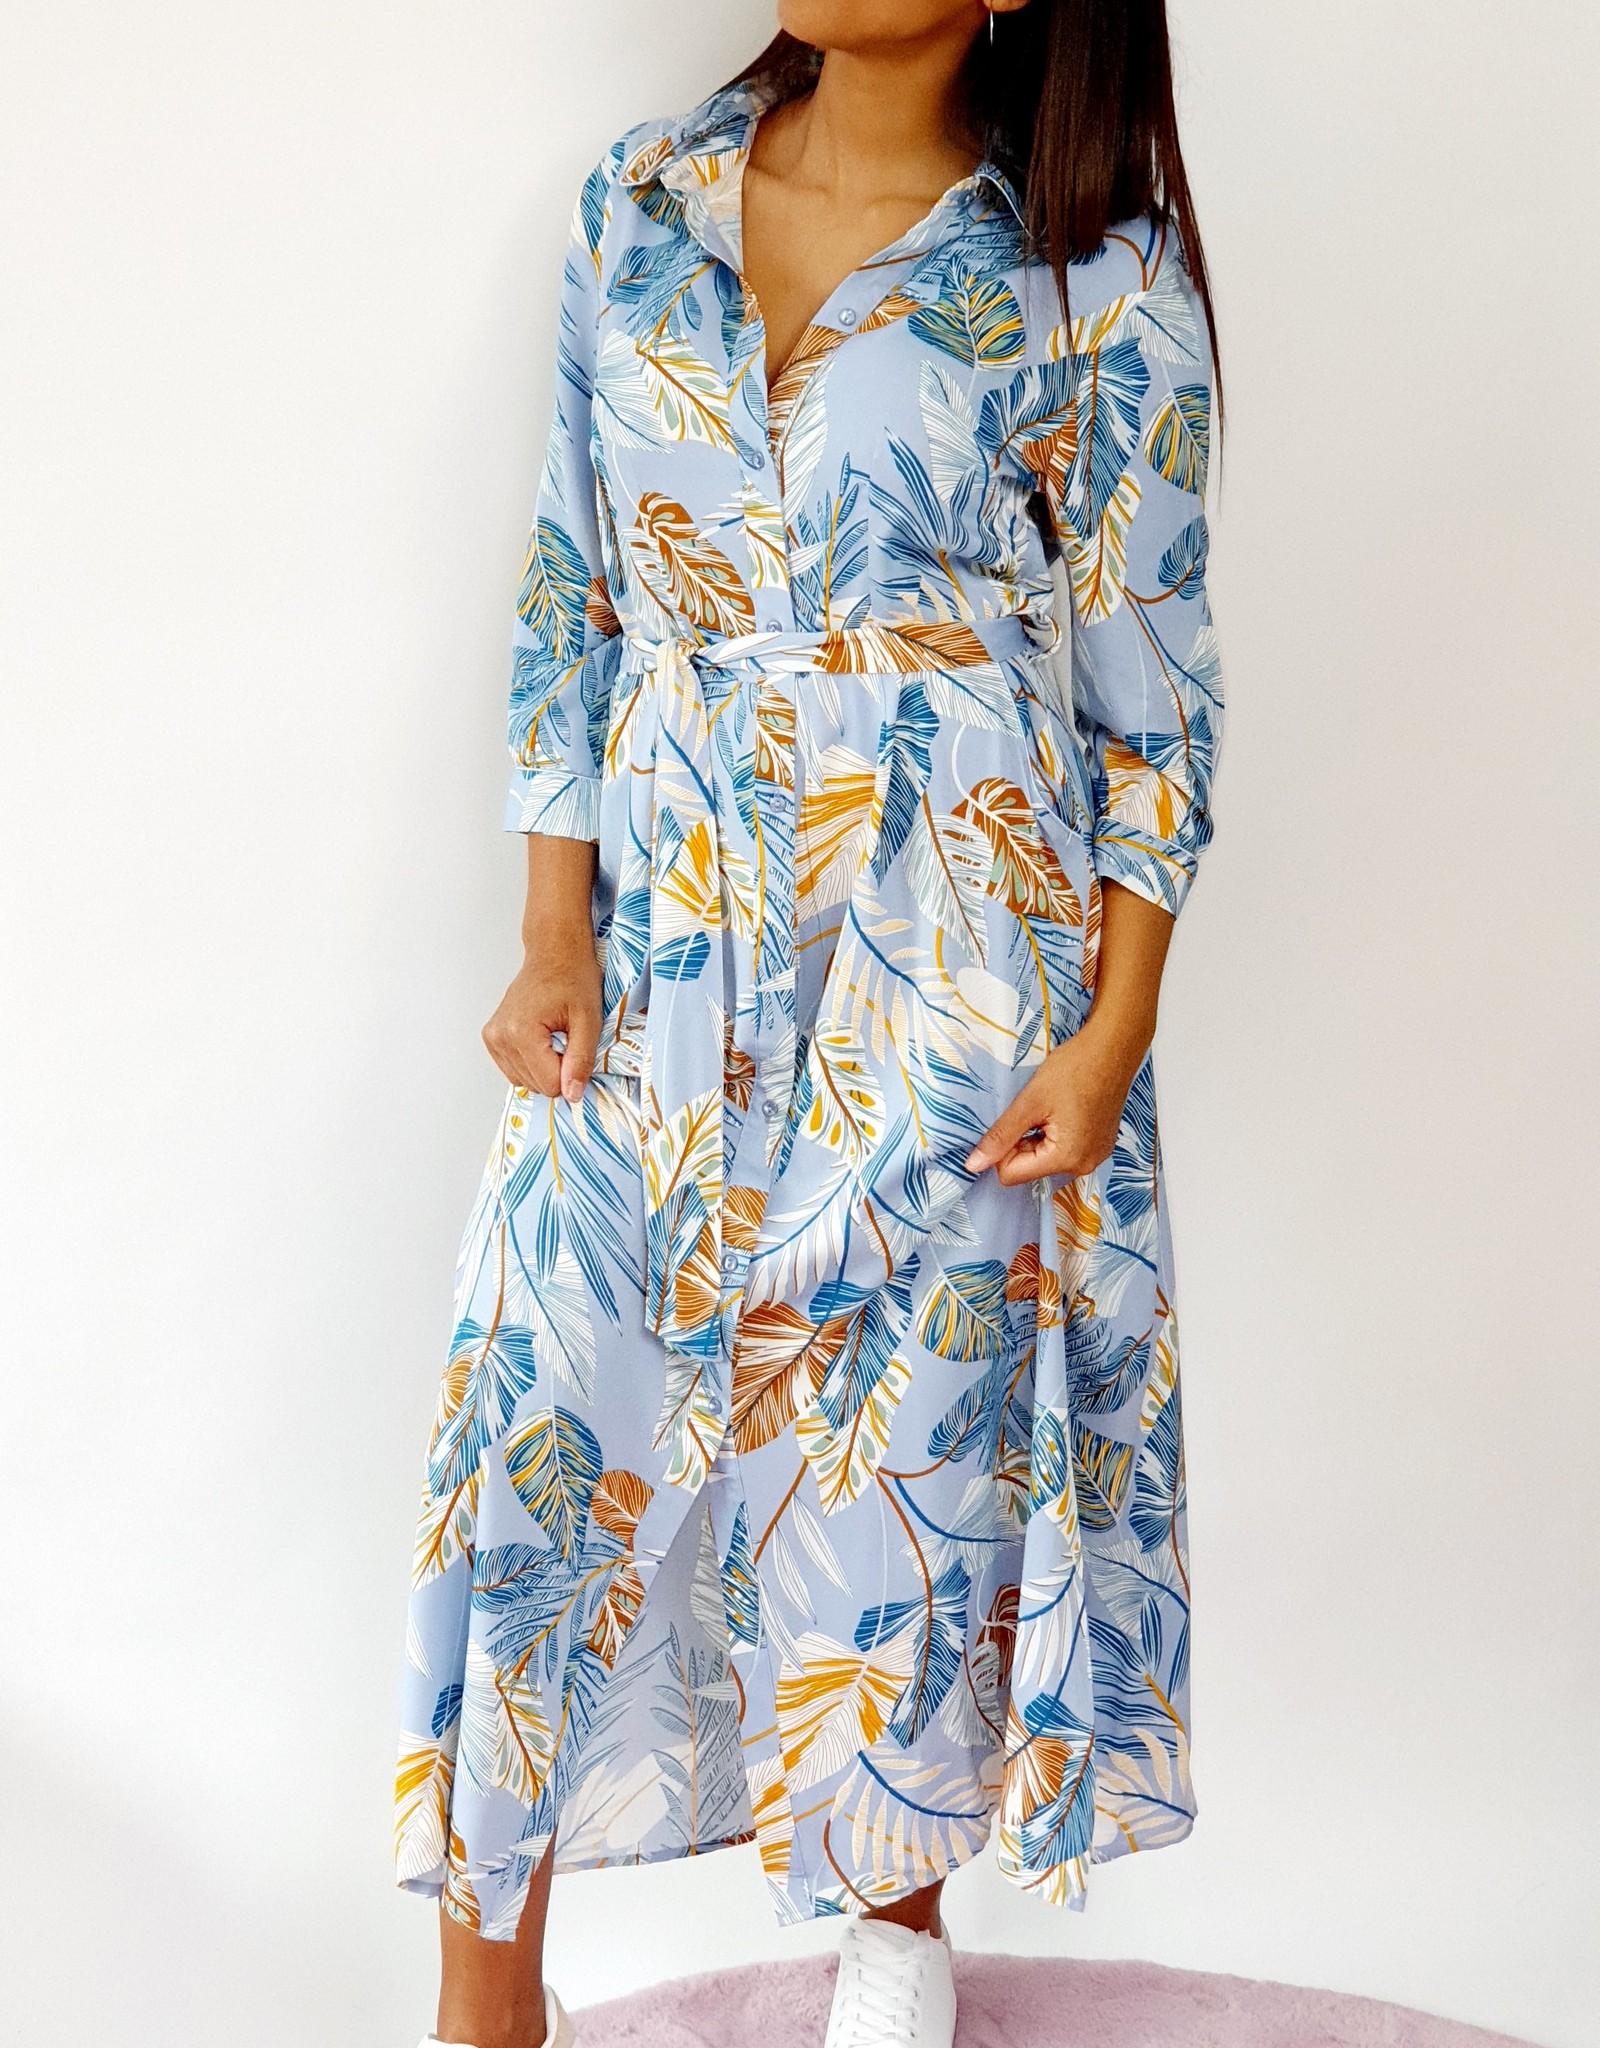 Thé jungle love dress